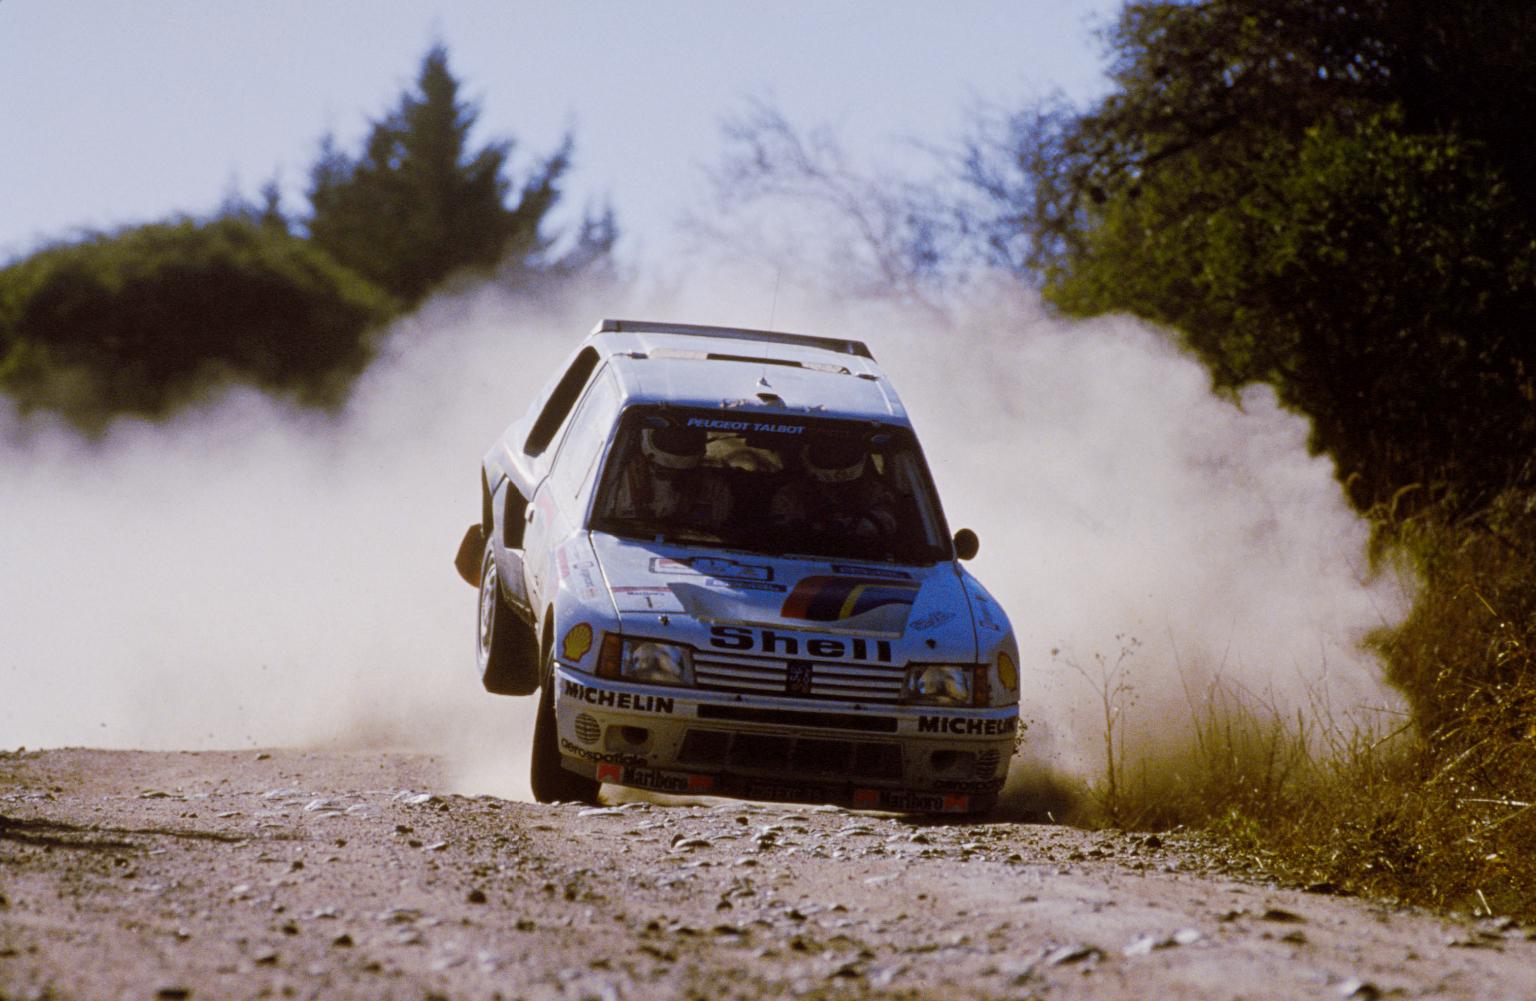 Carlos Reutemann WRC